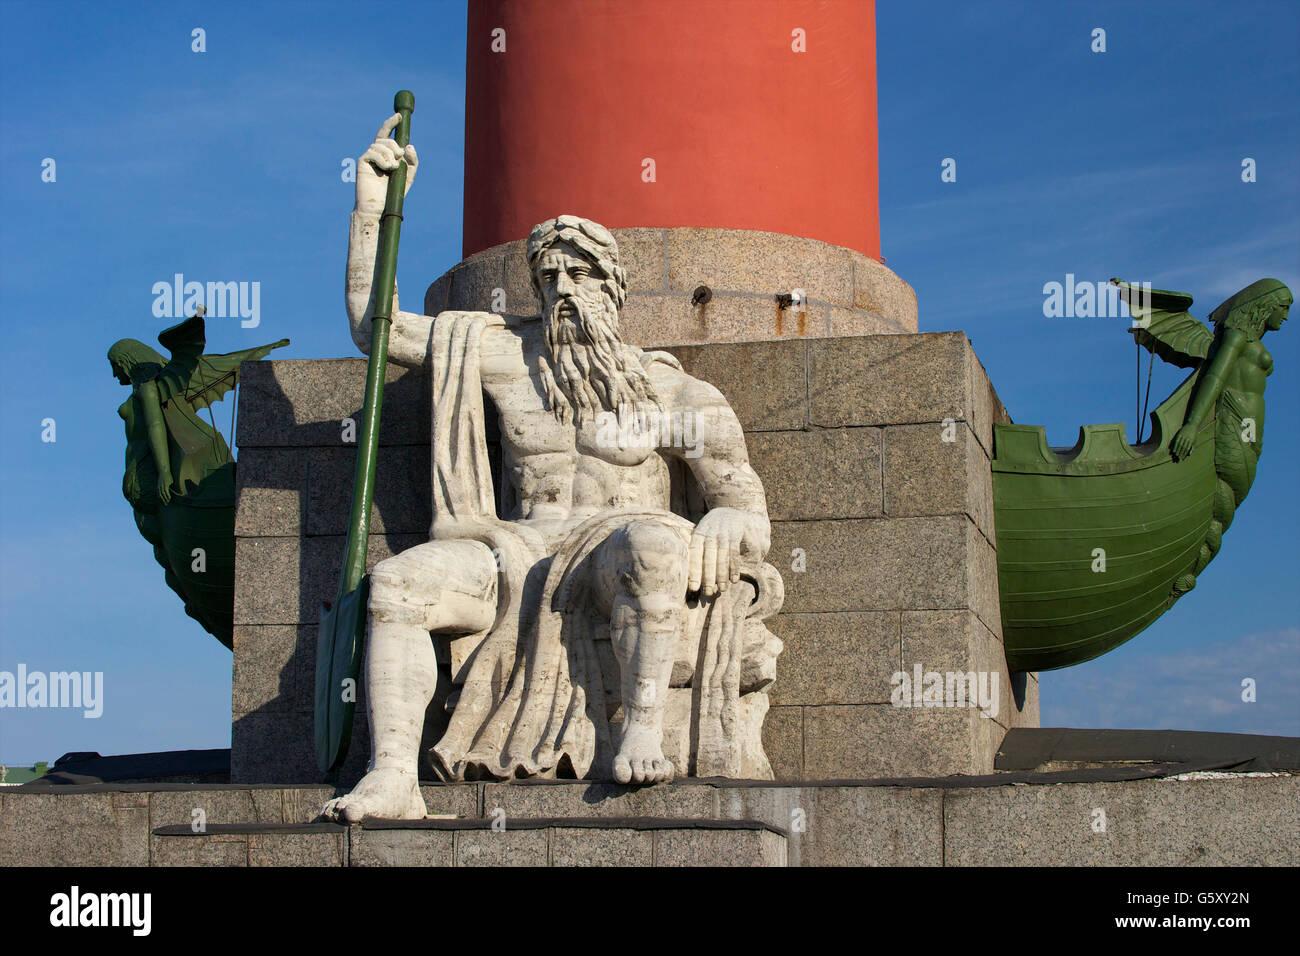 Pedestal of Rostral Column,  Strelka of Vasilievsky Island, Saint Petersburg, Russia - Stock Image